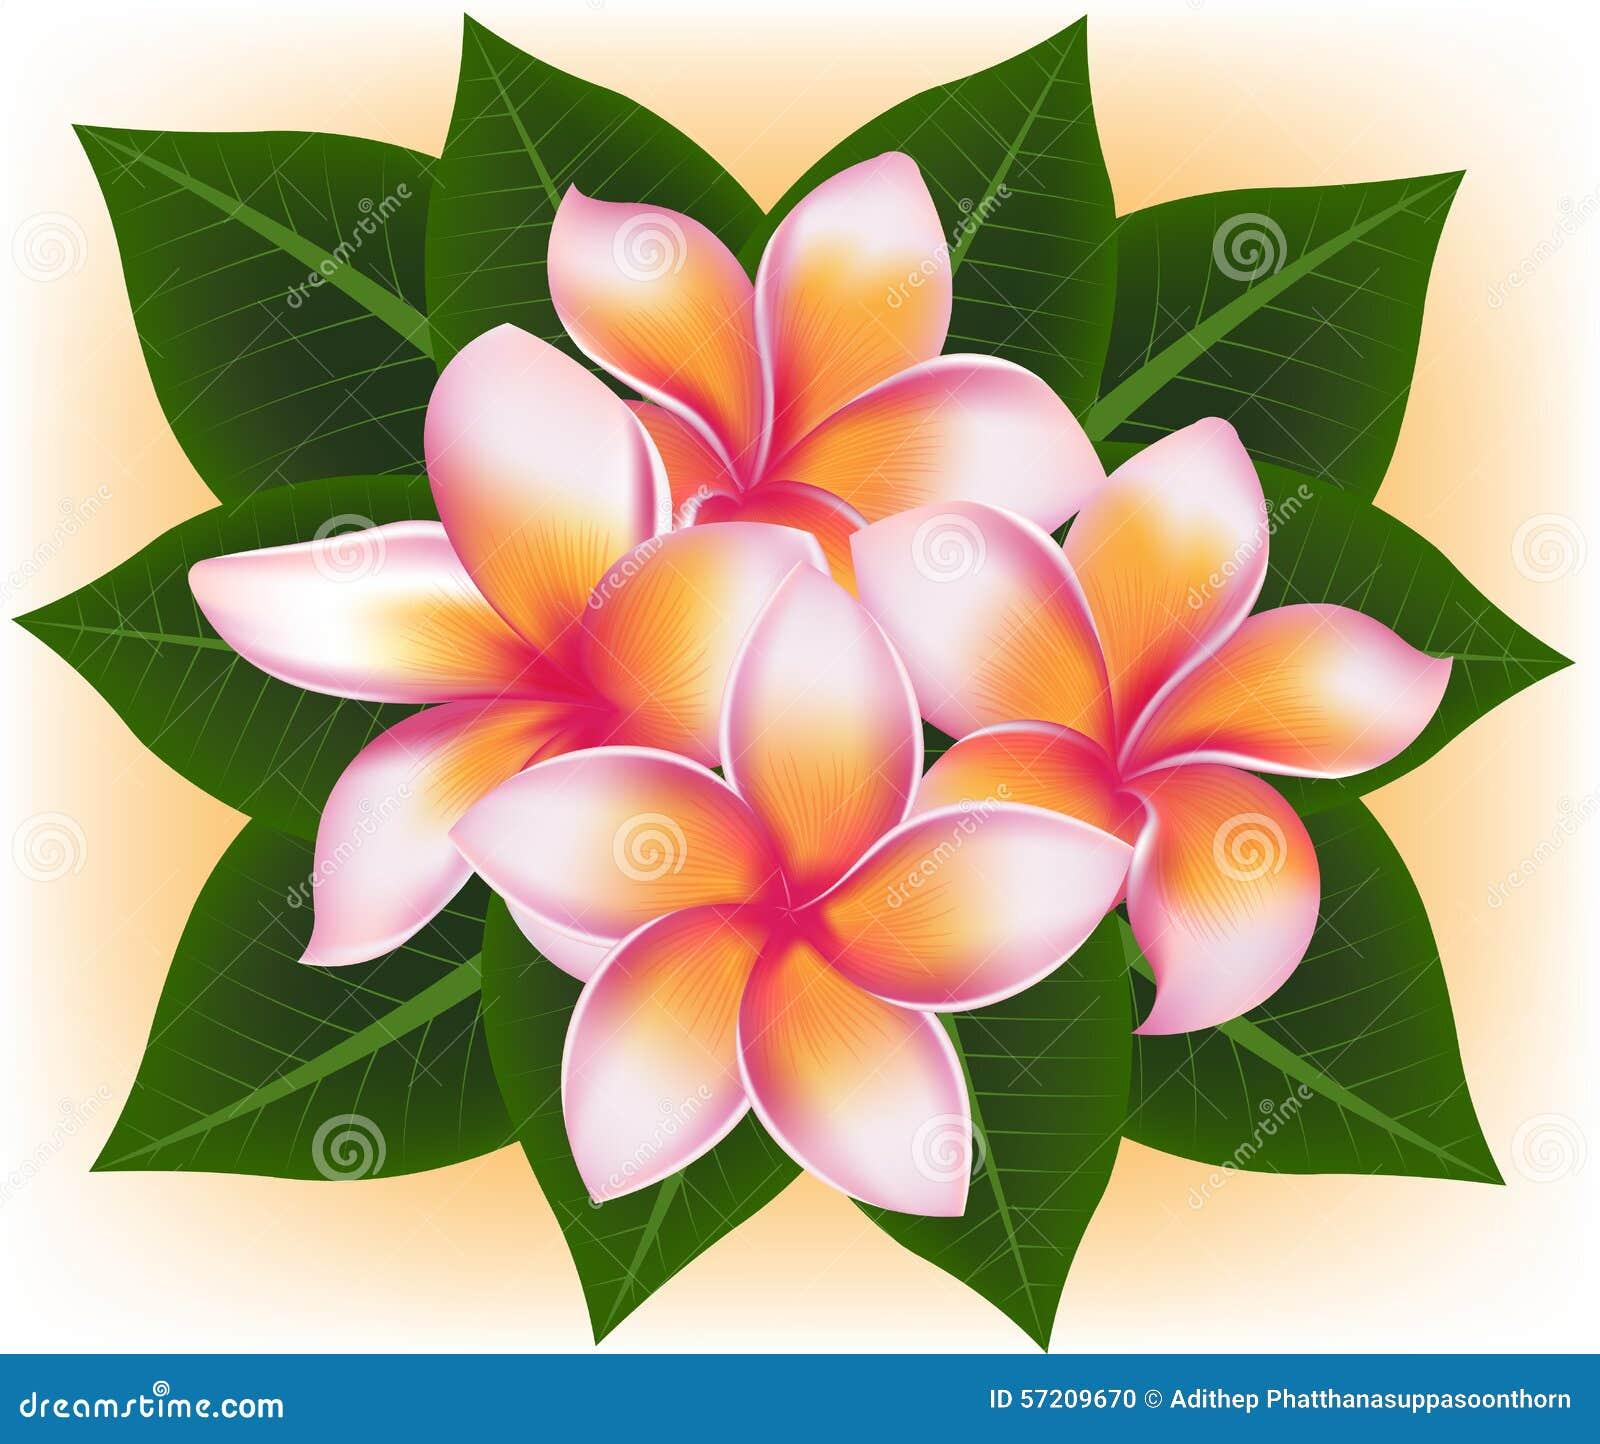 Illustration Of Hawaii Pink Flower Frangipani Plumeria Rubra Stock